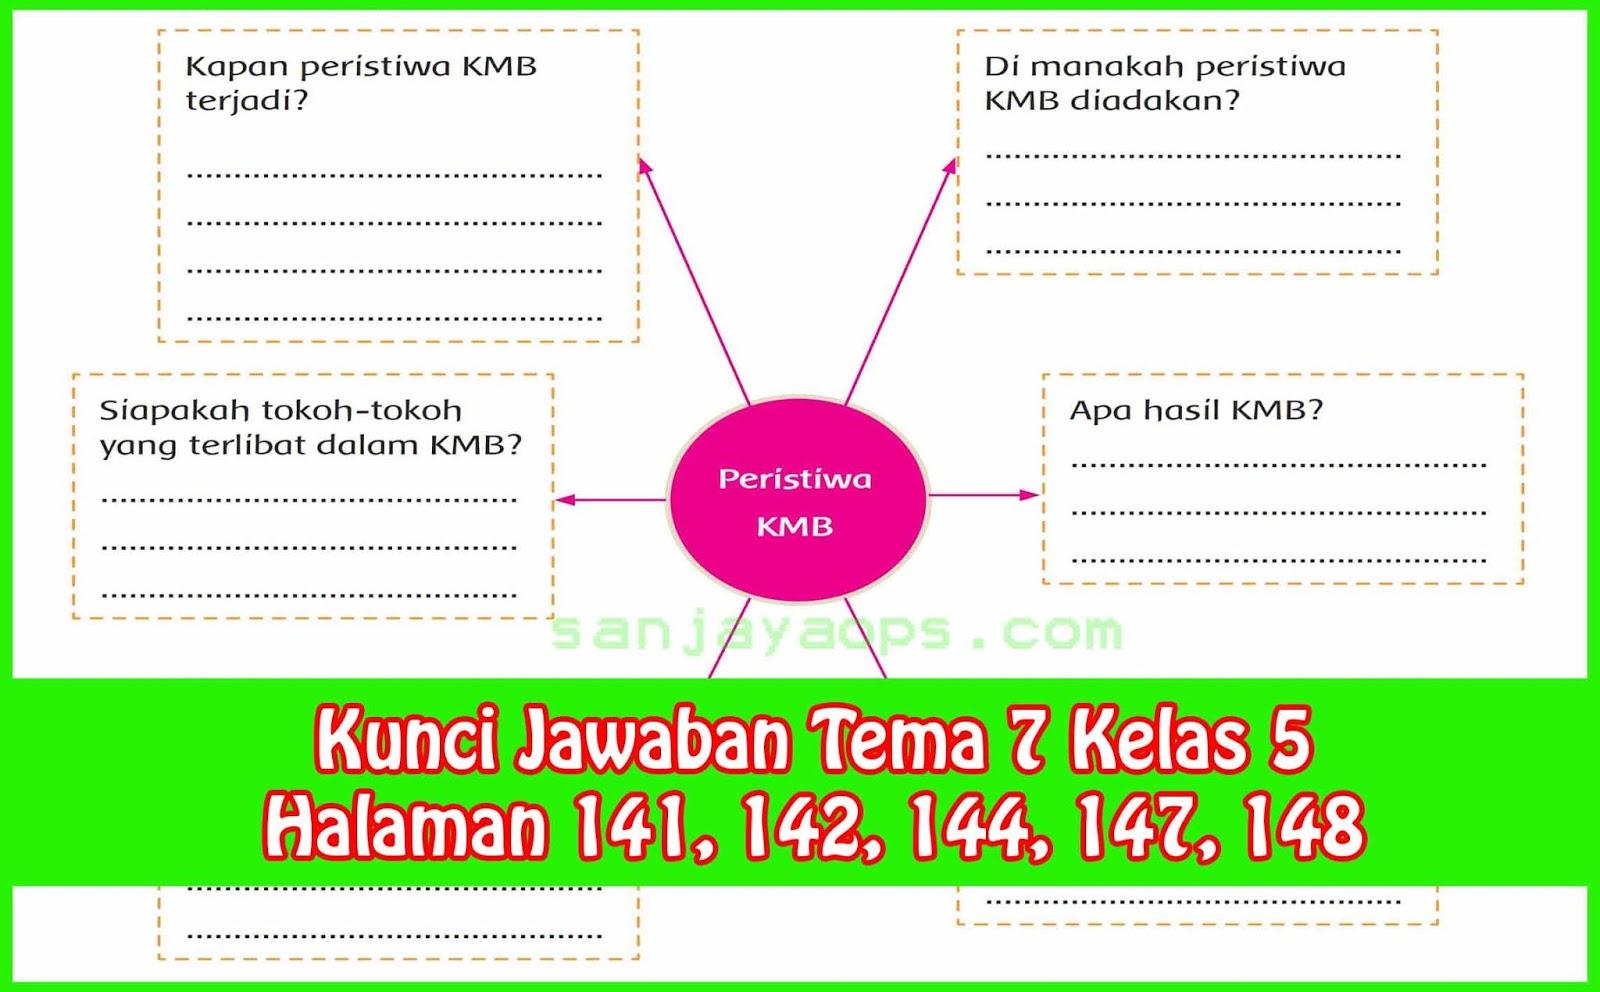 Kunci Jawaban Tema 1 Kelas 5 Halaman 77